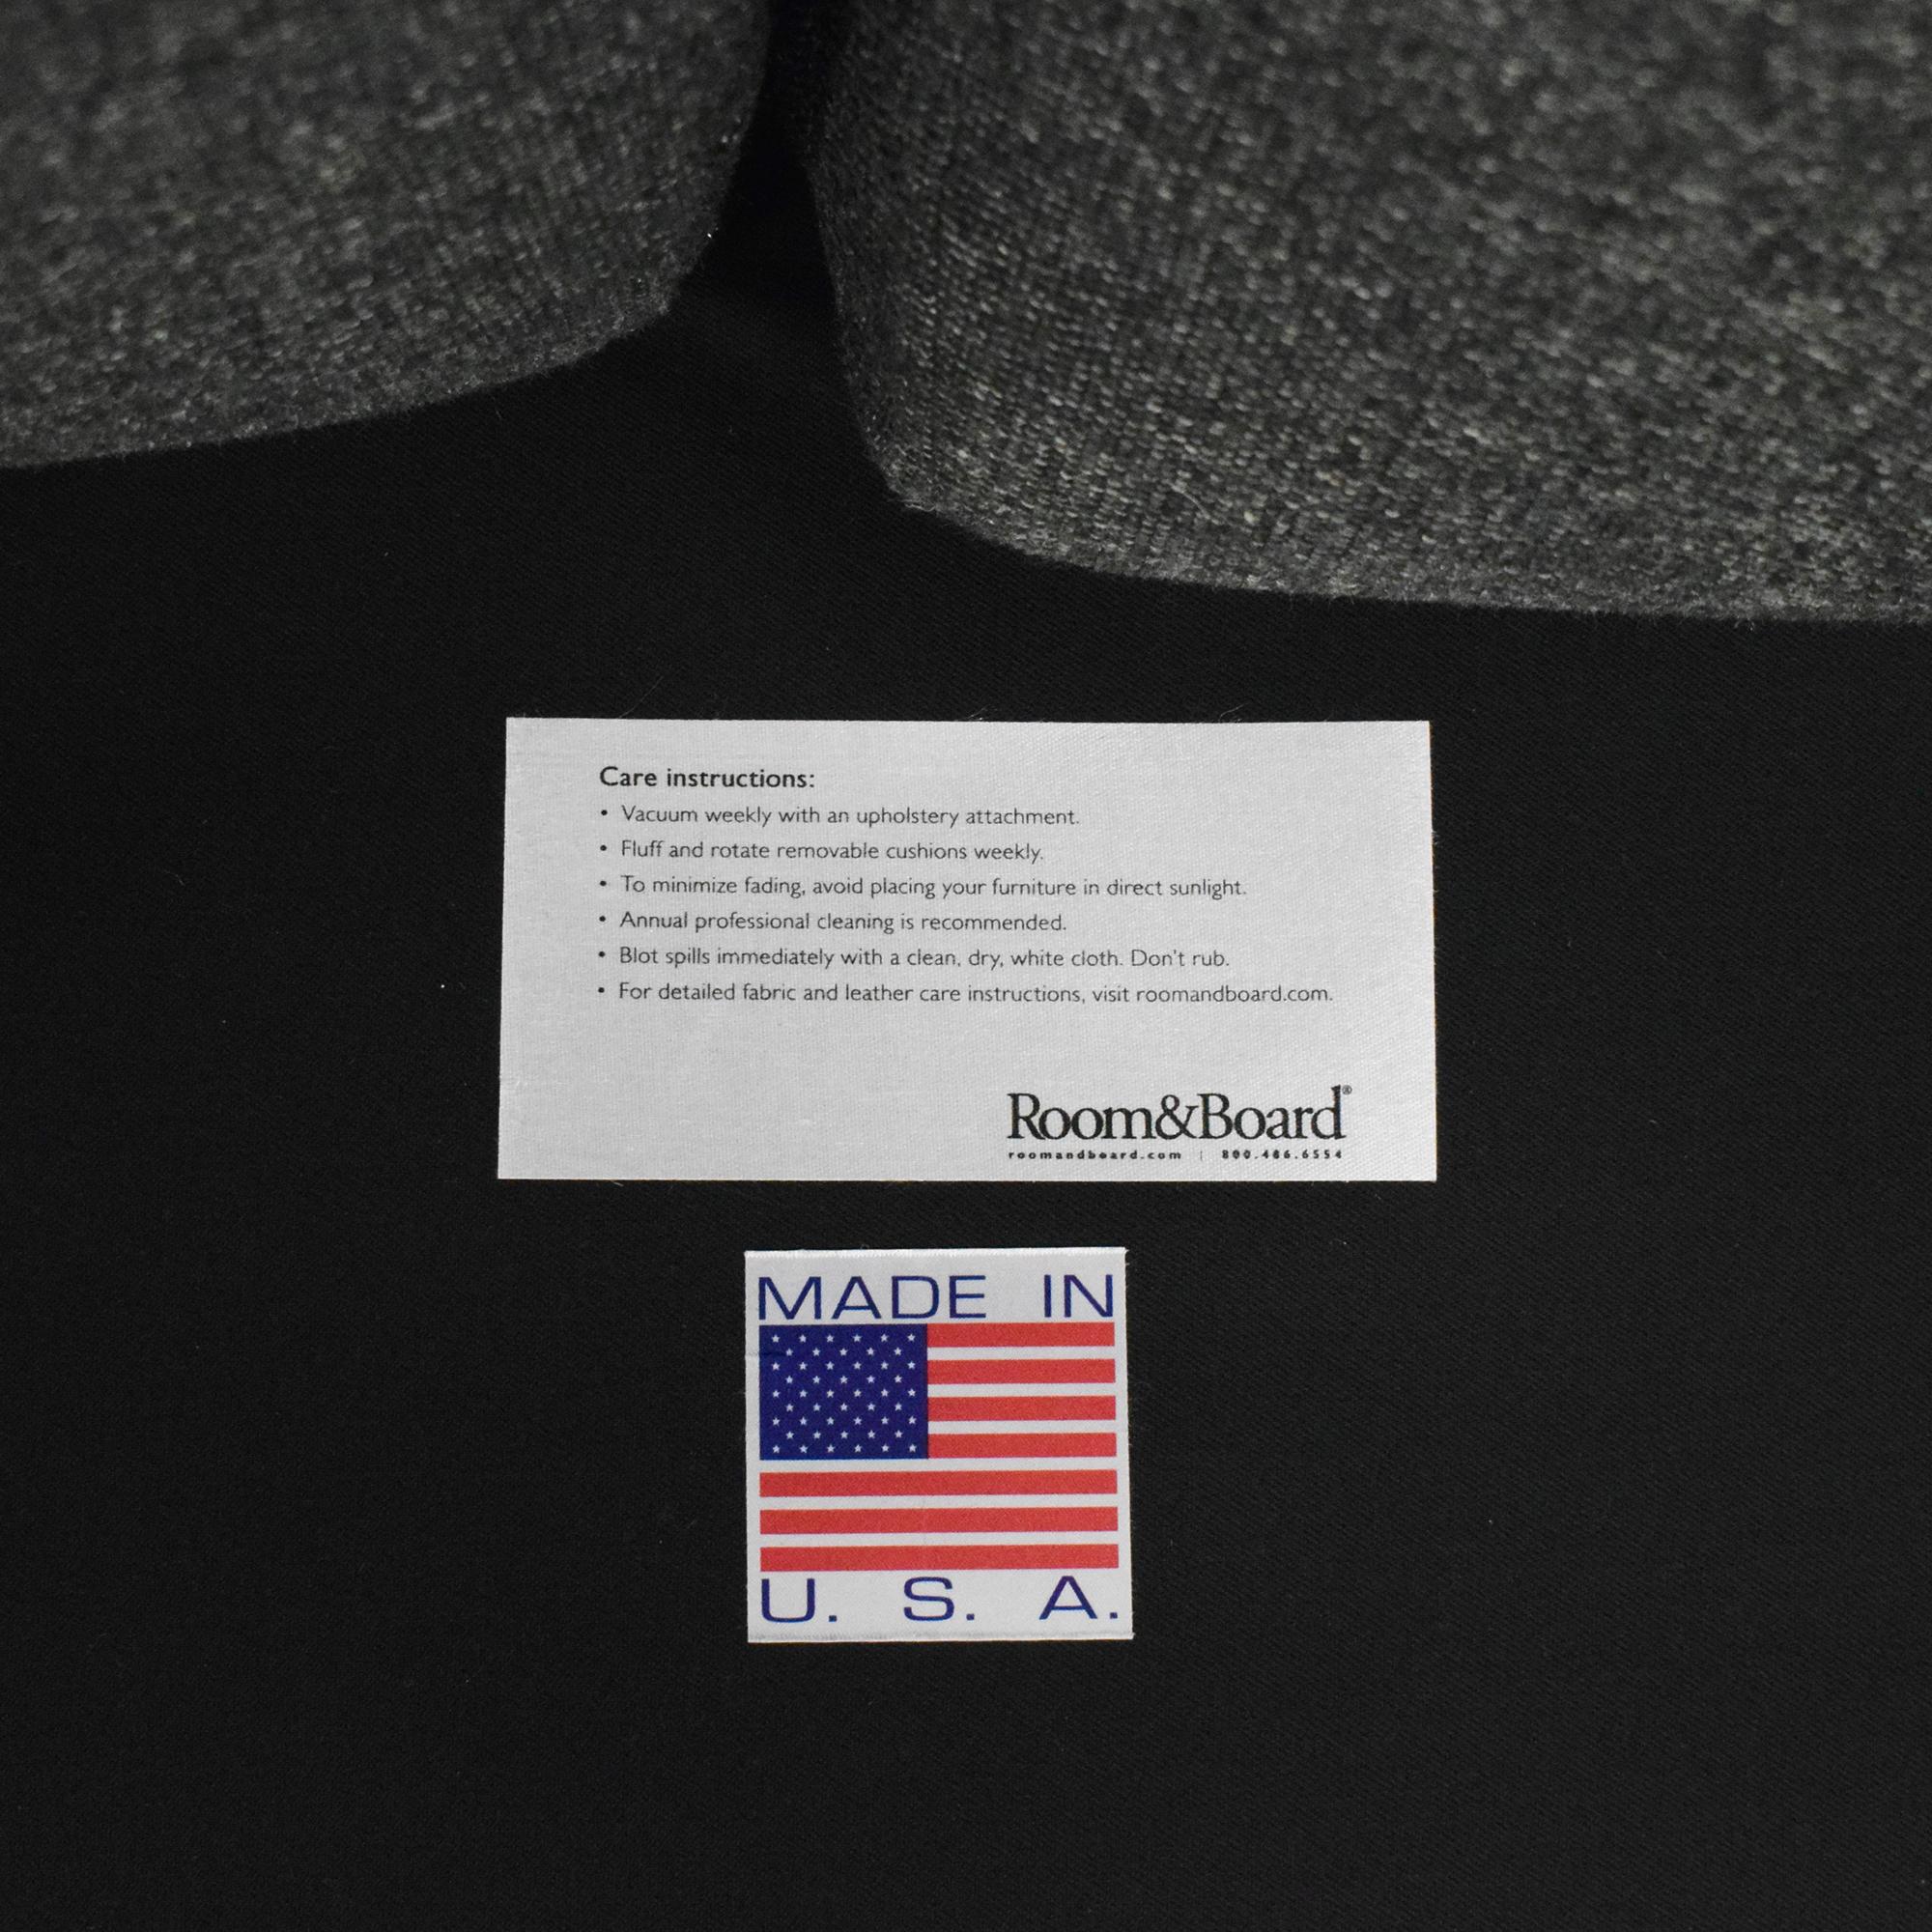 Room & Board Room & Board Easton Sofa coupon